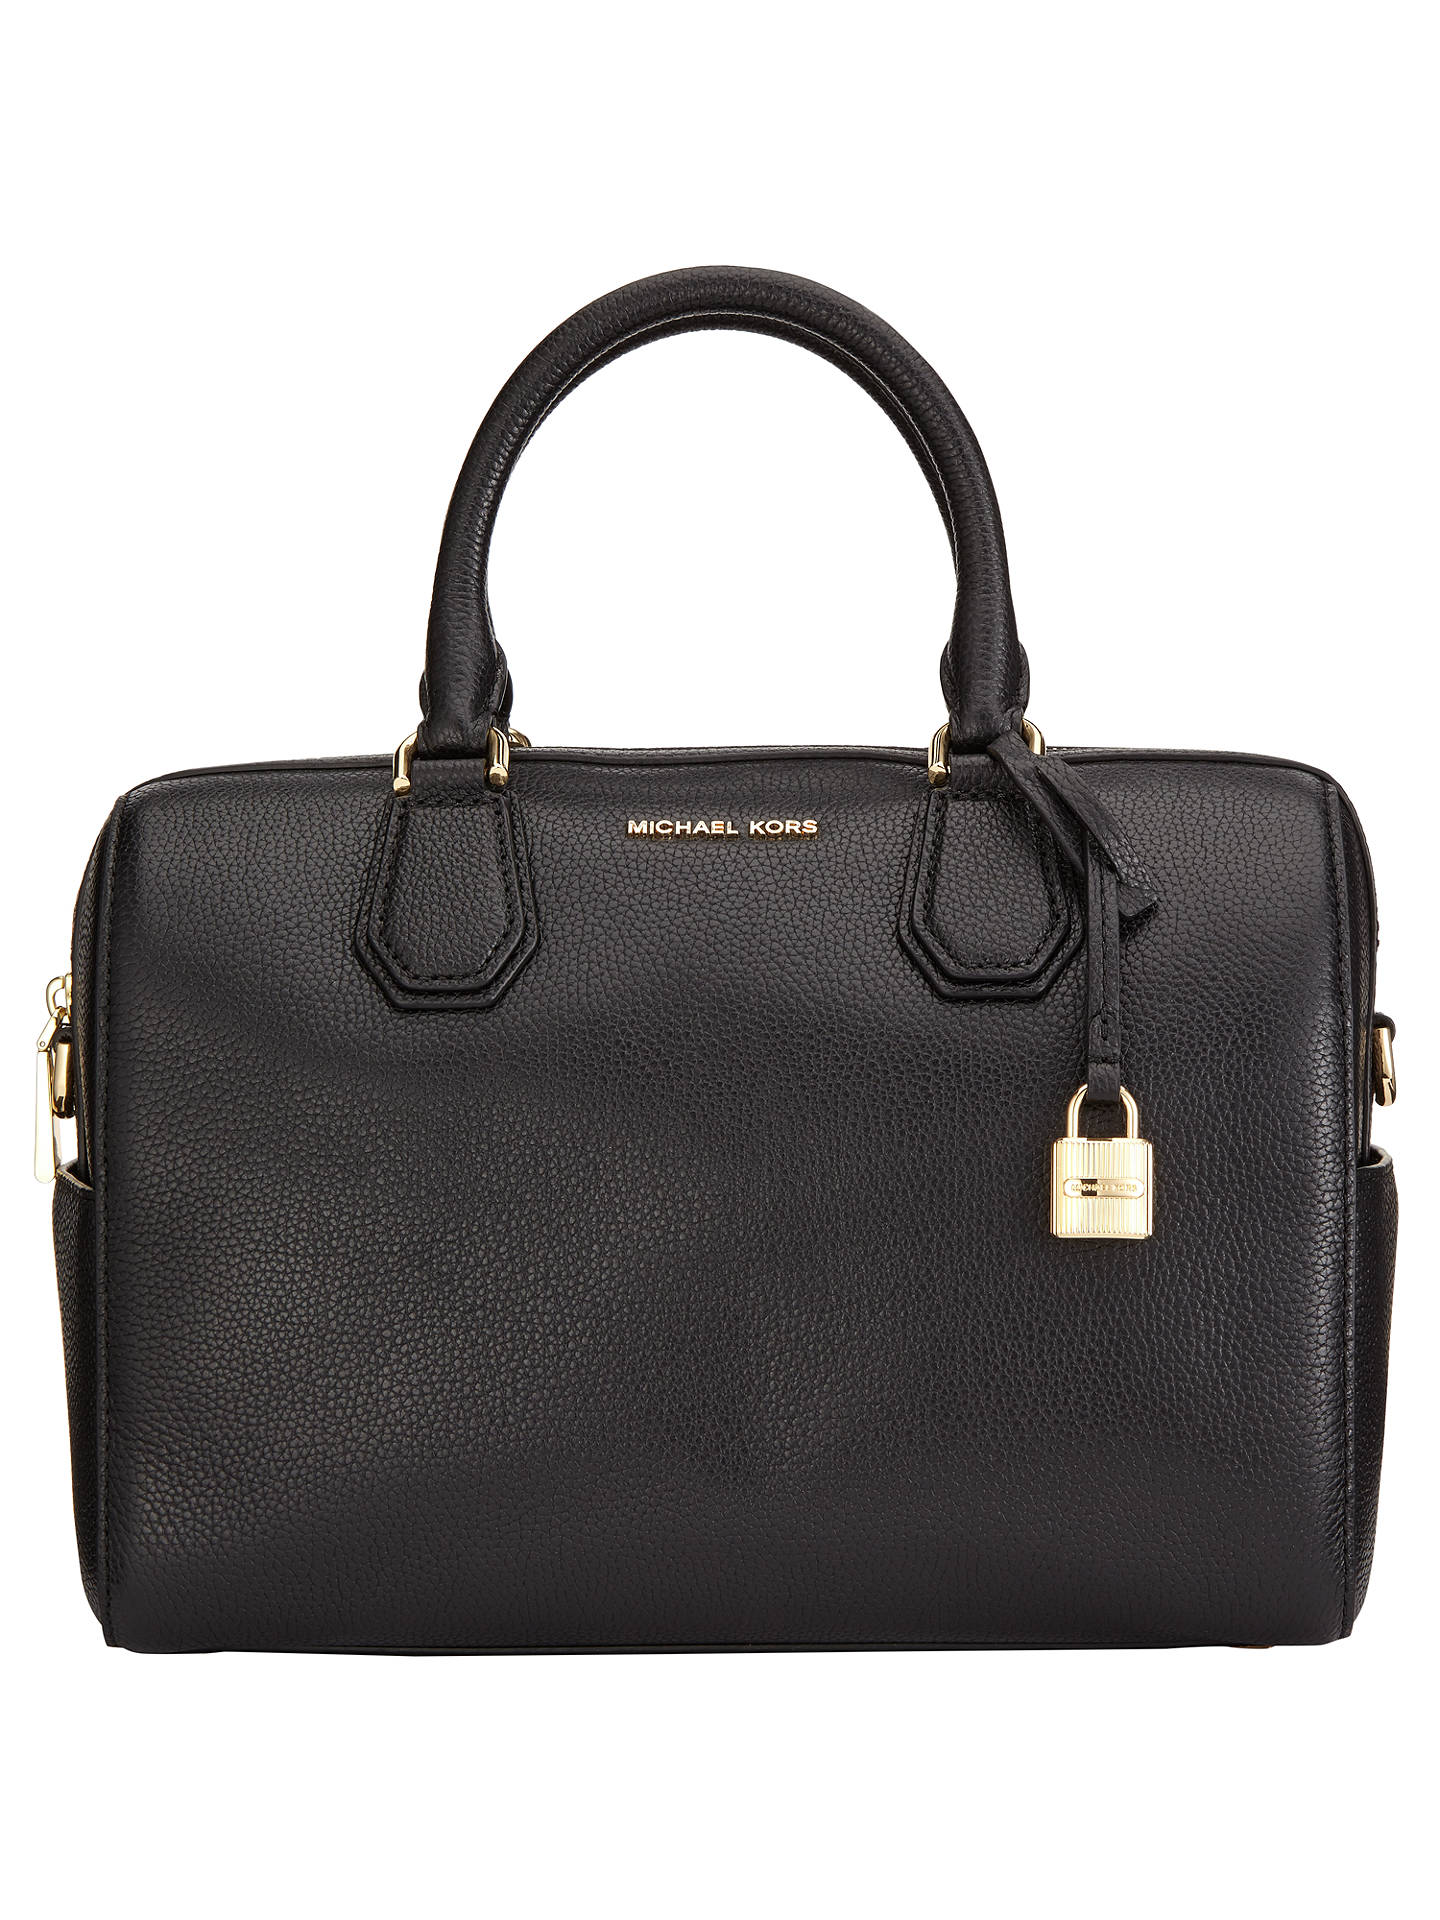 0b11f40244b5 Buy MICHAEL Michael Kors Mercer Medium Duffle Weekend Bag, Black Online at  johnlewis.com ...